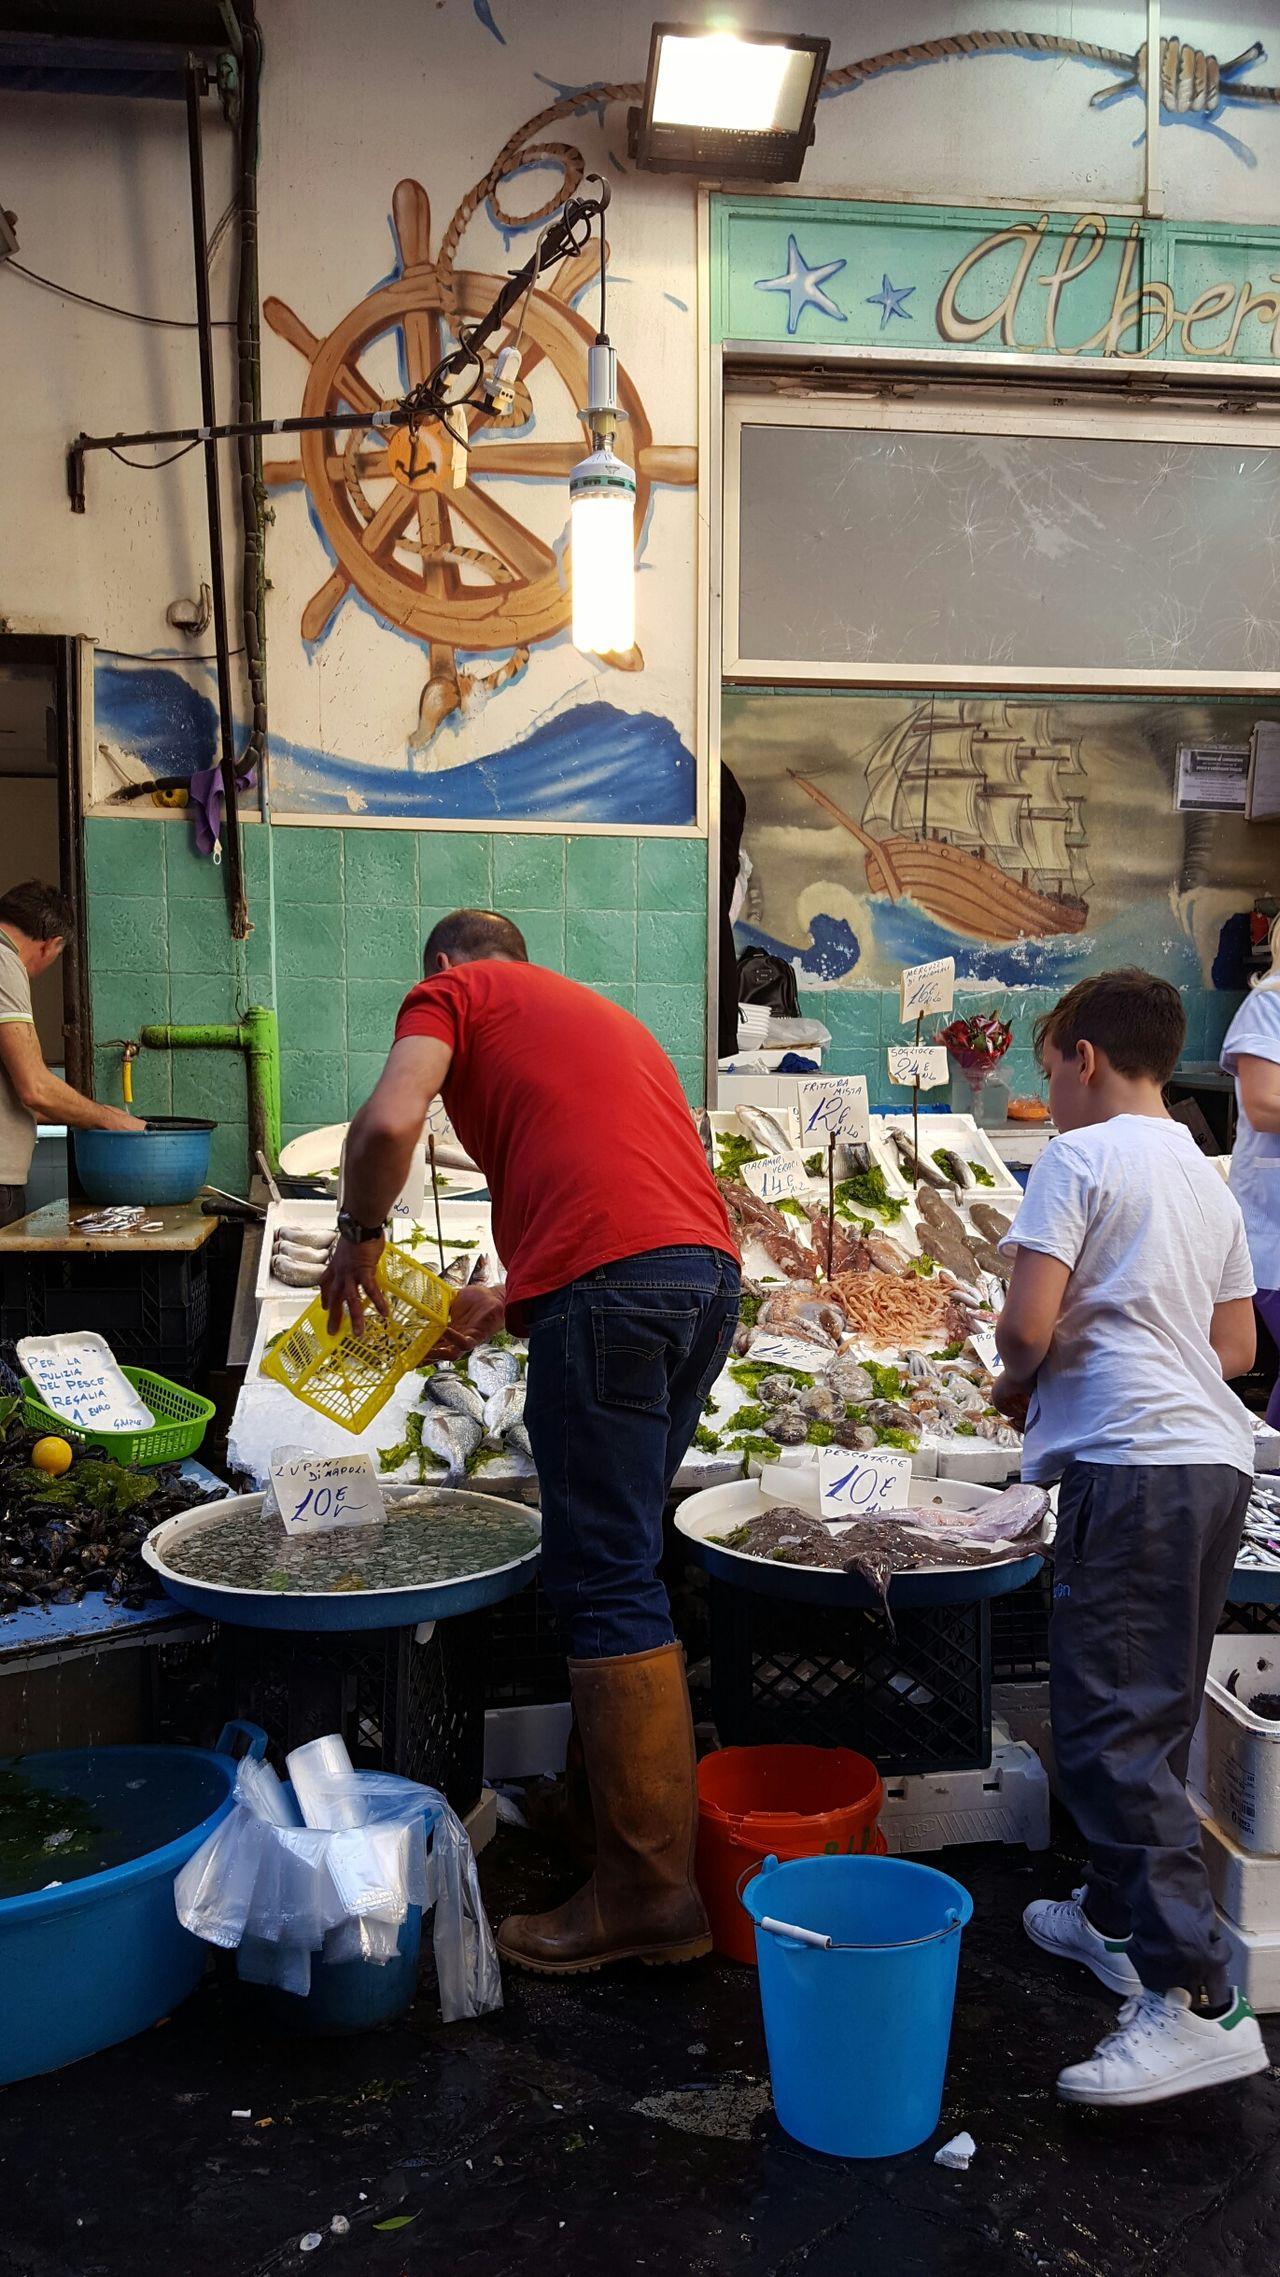 Market Italy🇮🇹 Napoli ❤ Napoli Urbanphotography Italia City Food Food♡ Fish Market Seafood Market Octopus Market